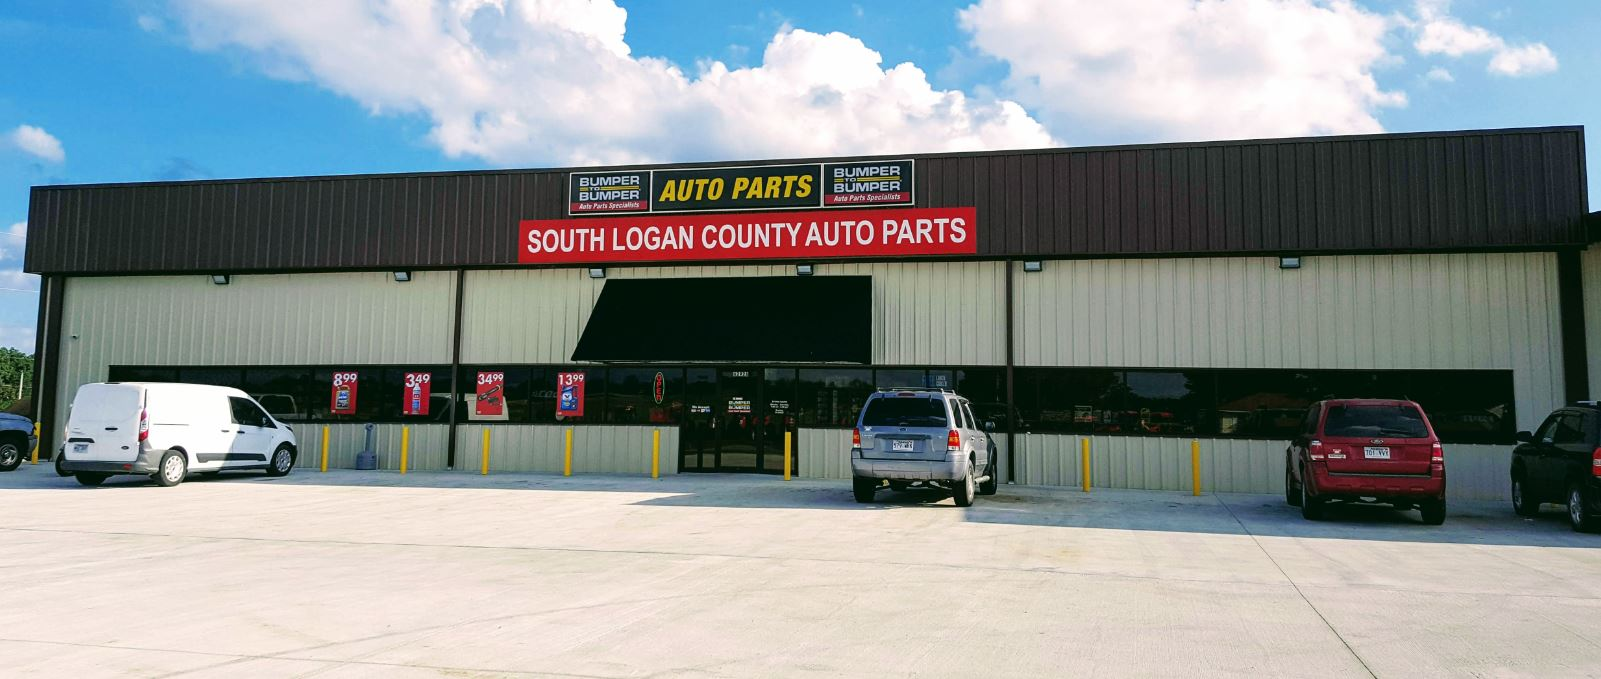 South Logan County Auto Parts